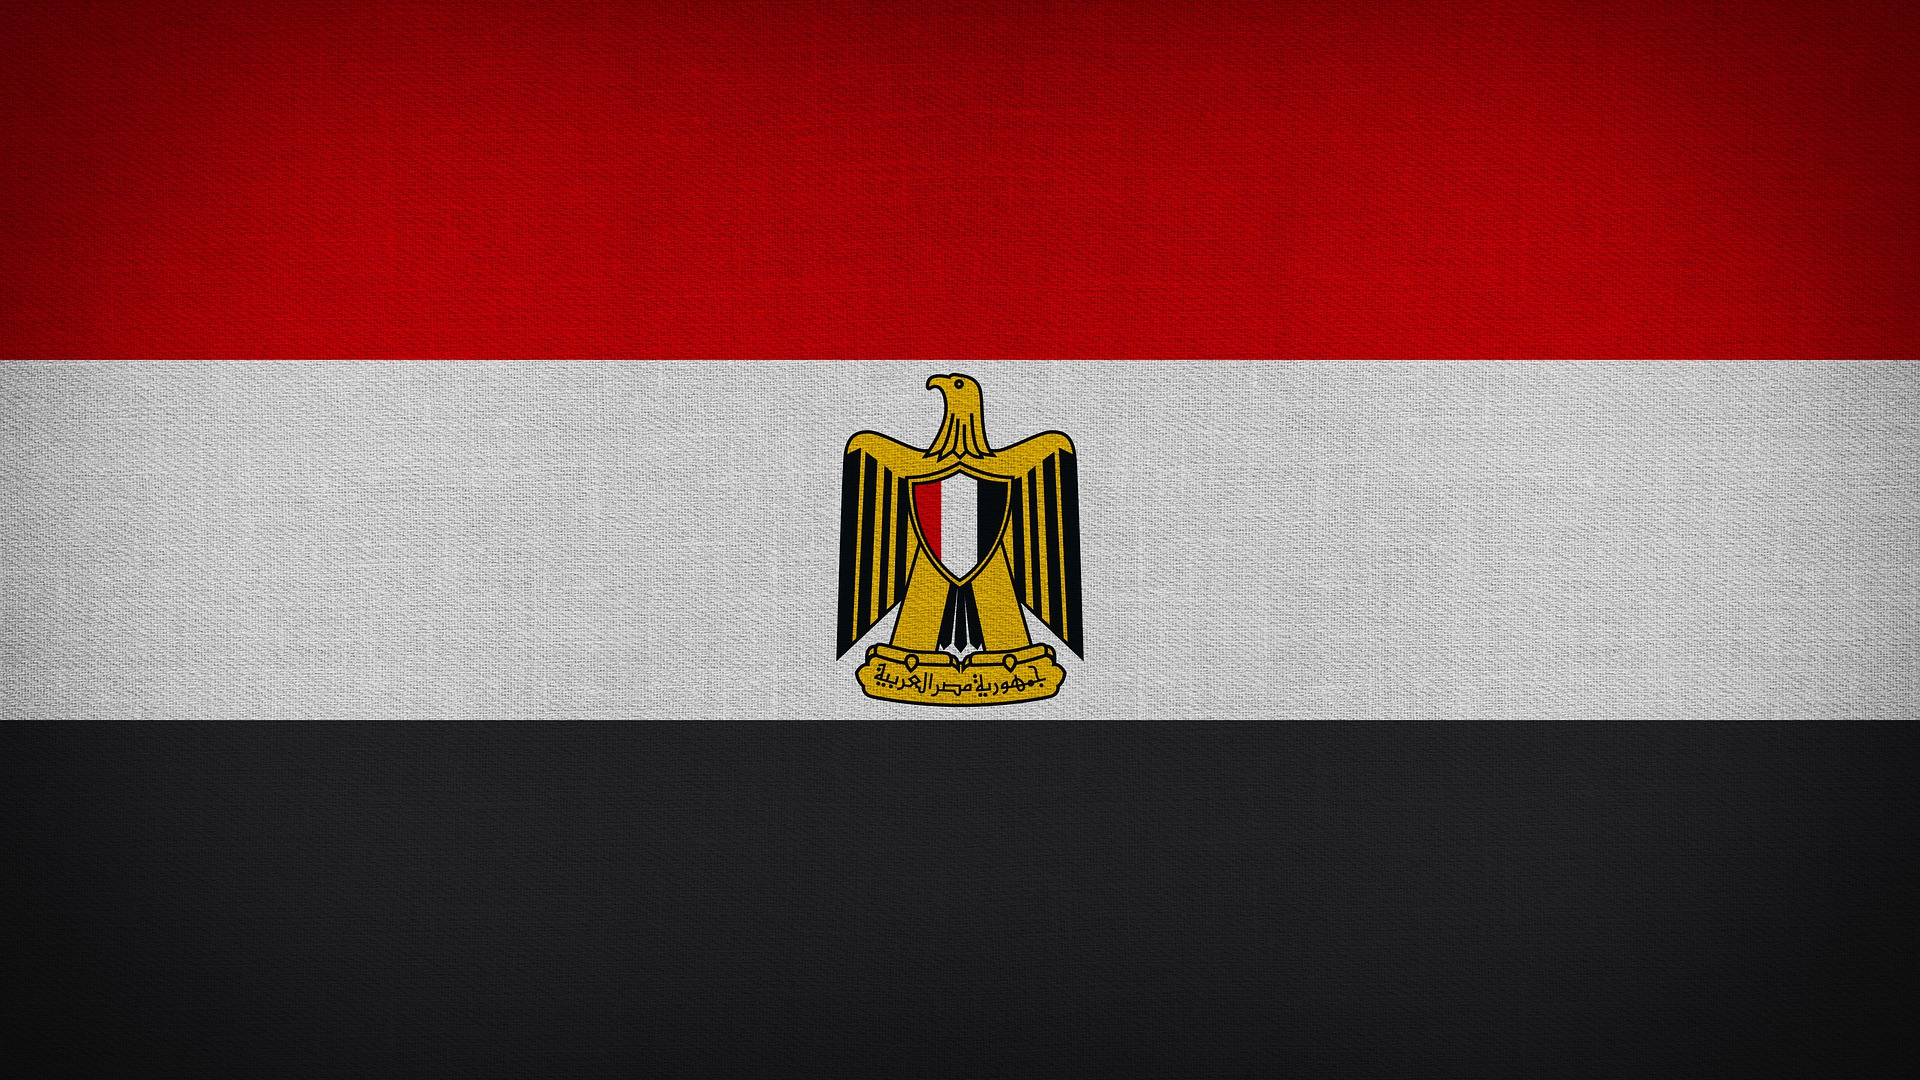 تحركات مصر نحو غزة.. دعم مادي وحشد دولي